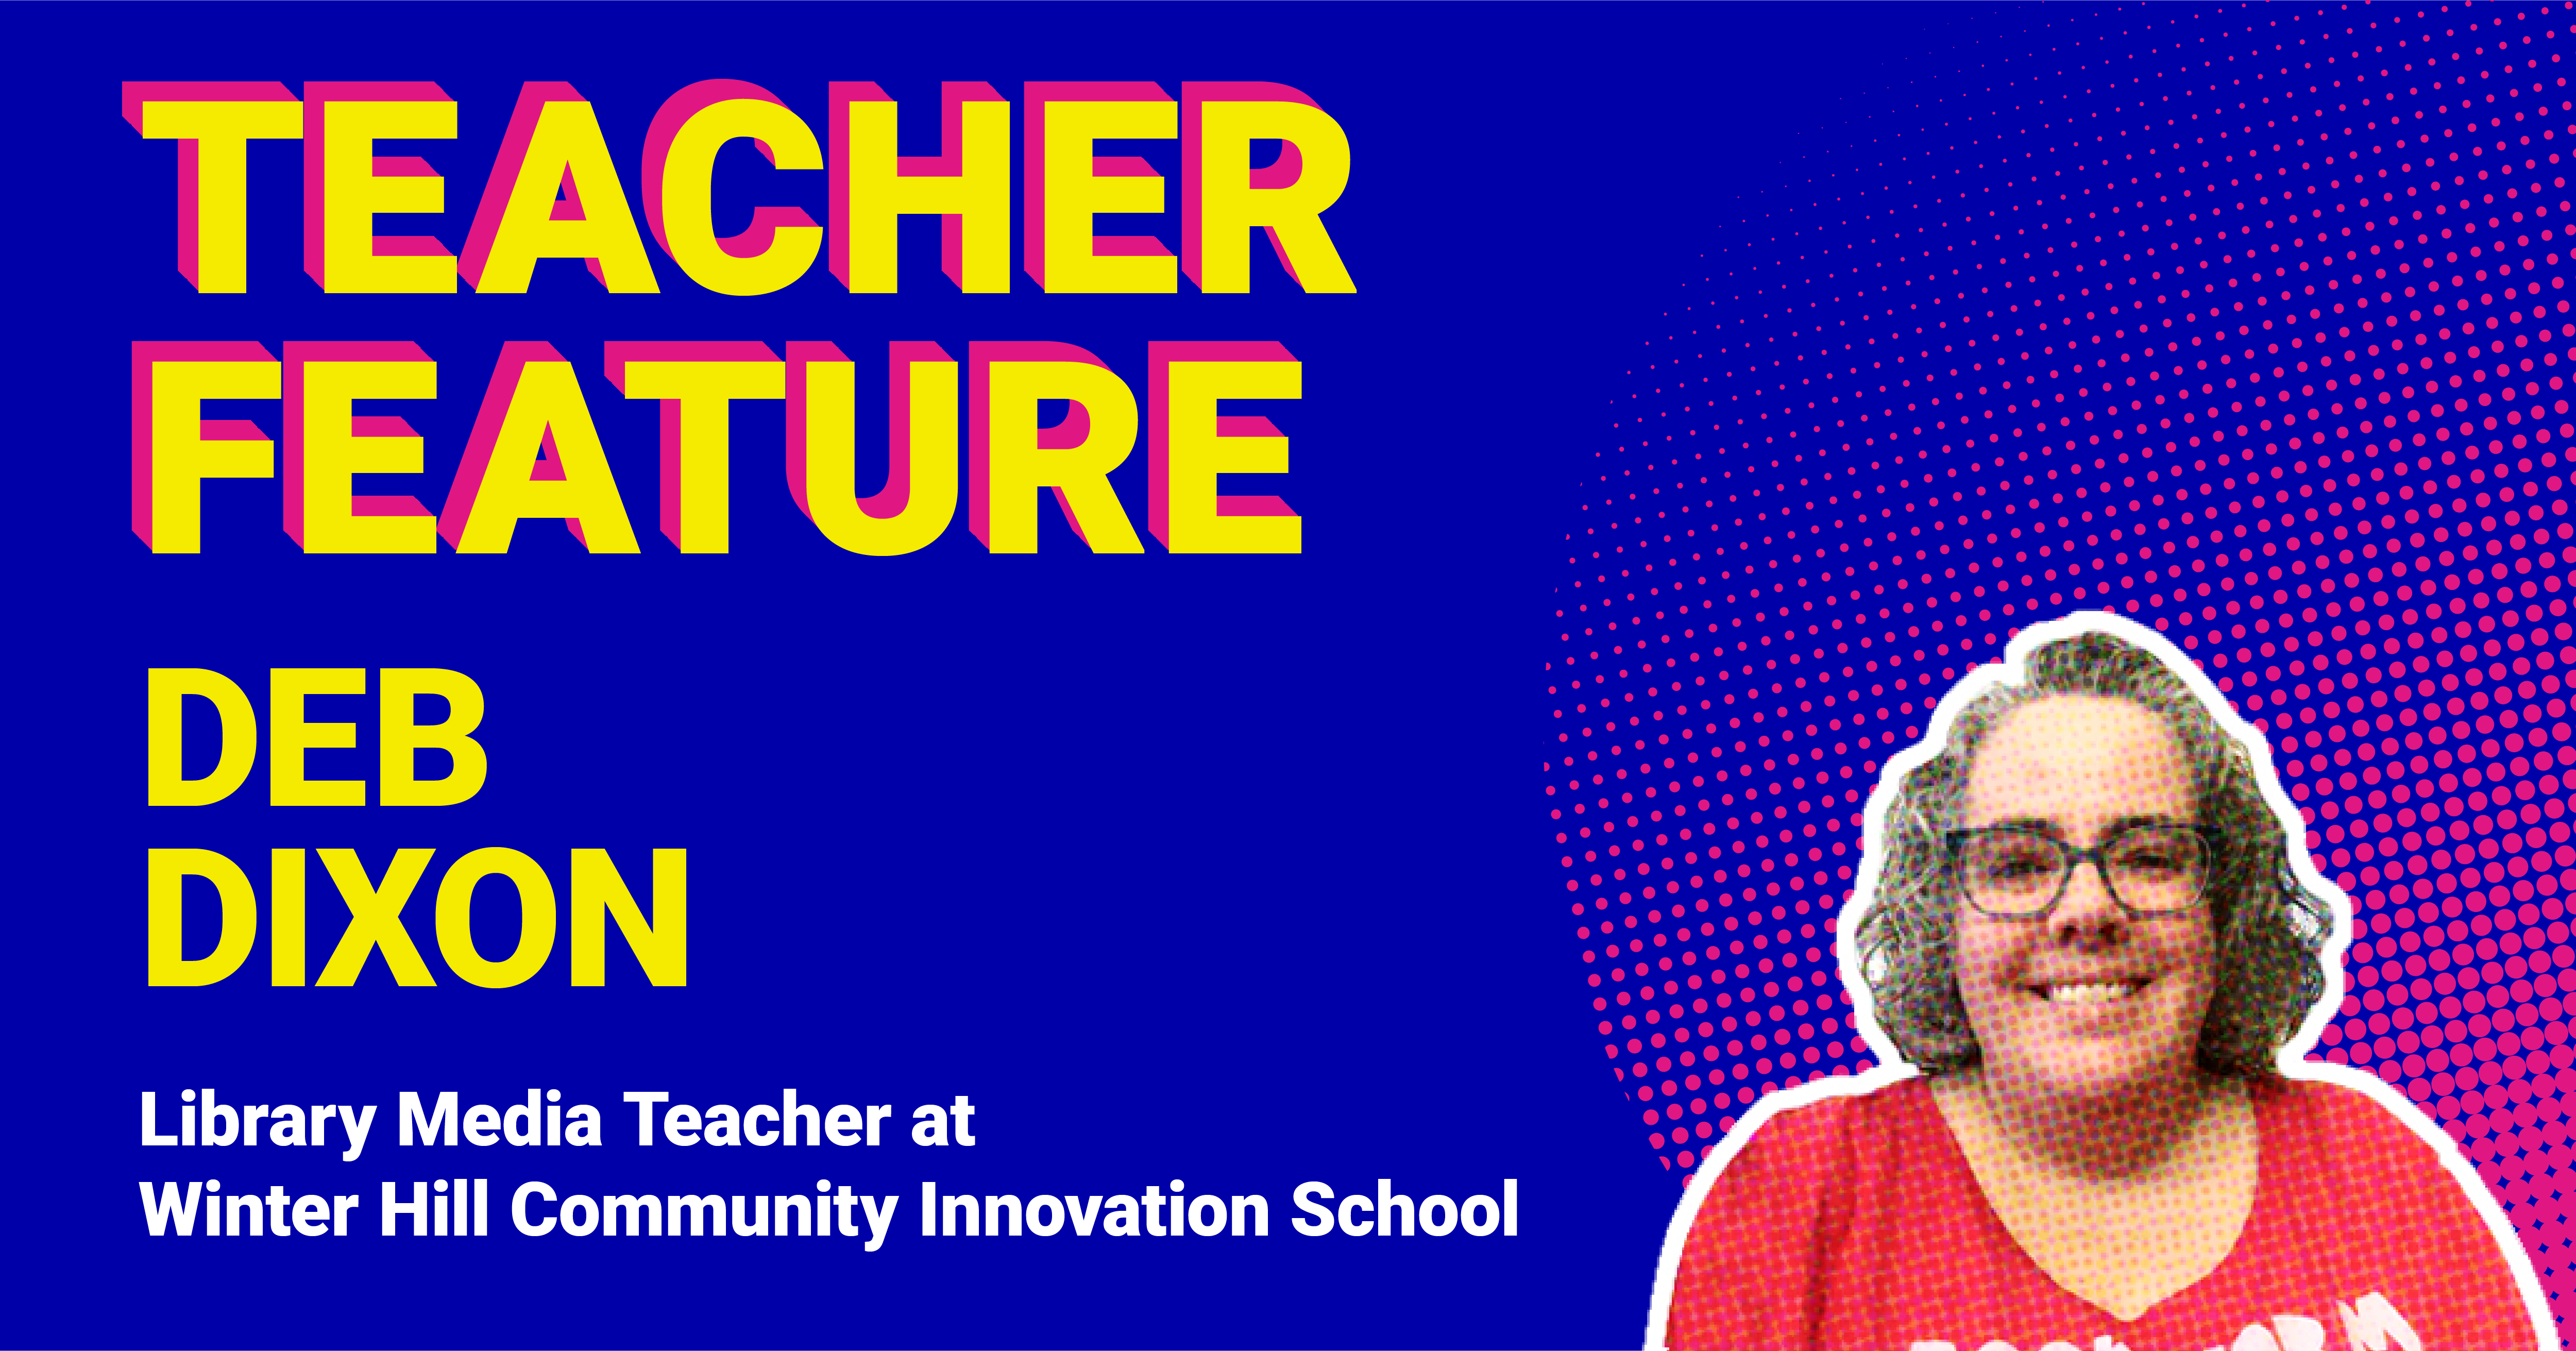 Teacher Feature: Deb Dixon